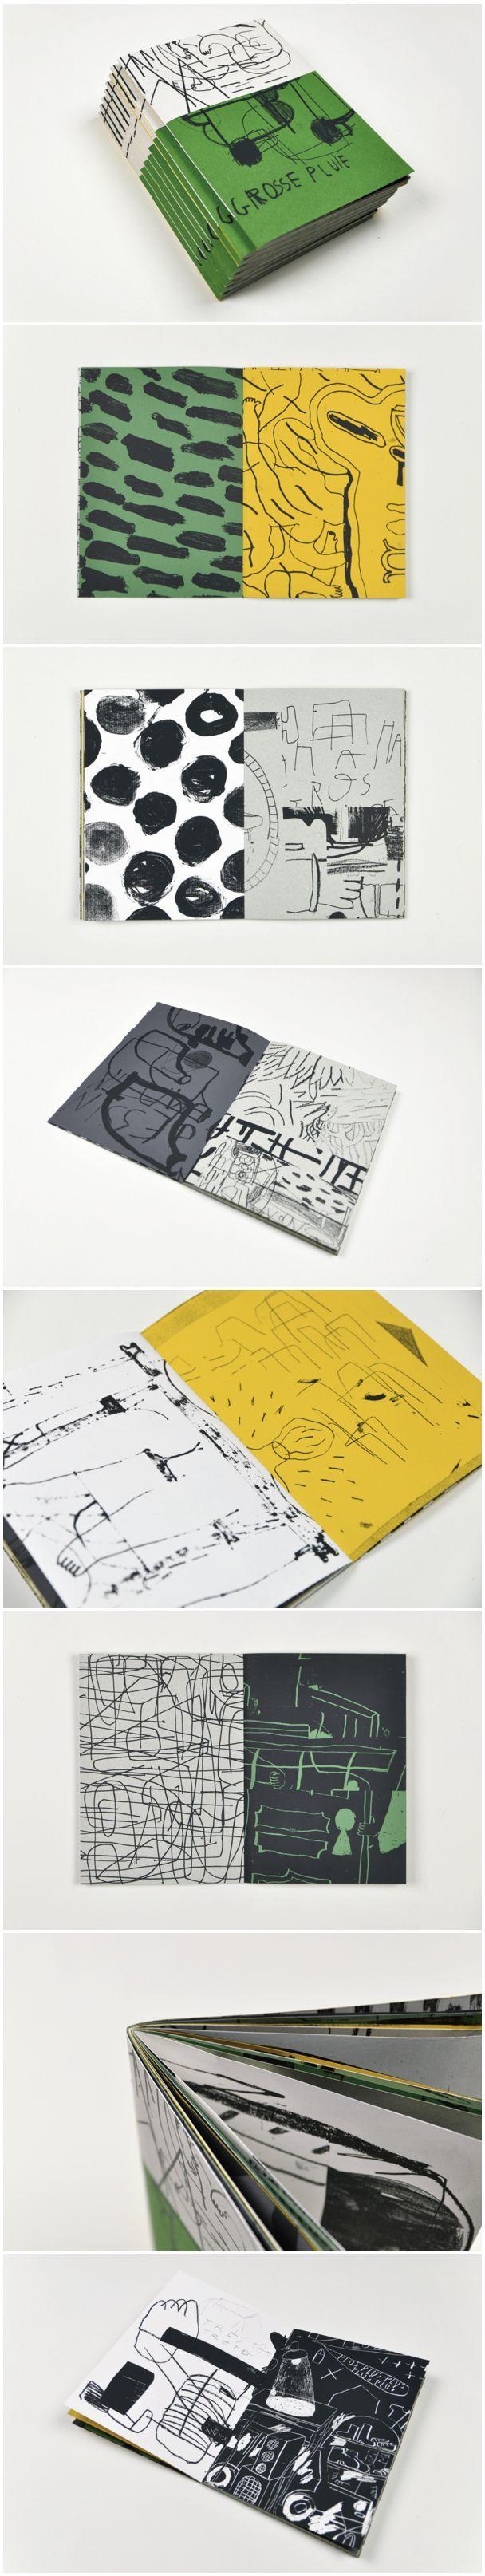 Grosse pluie | Screen printed book by Marion Jdanoff and Damien Tran